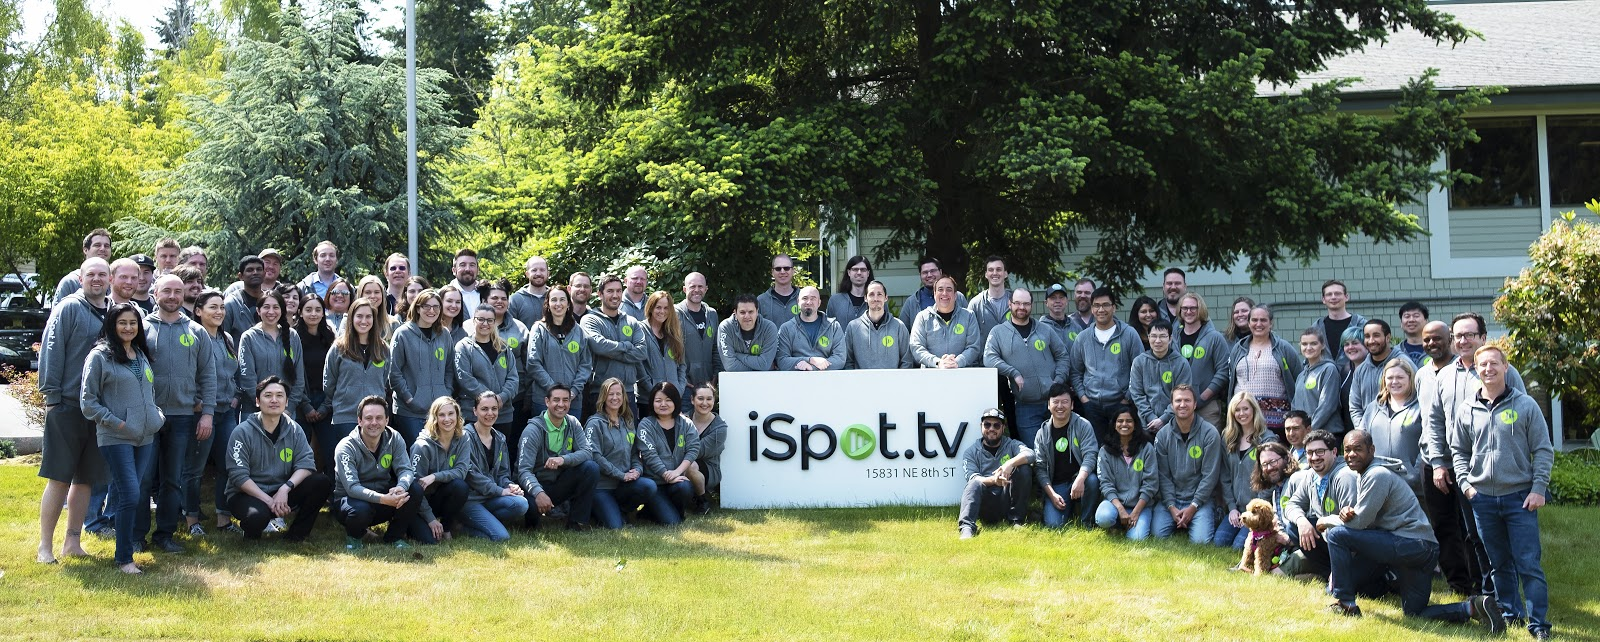 iSpot.tv team photo